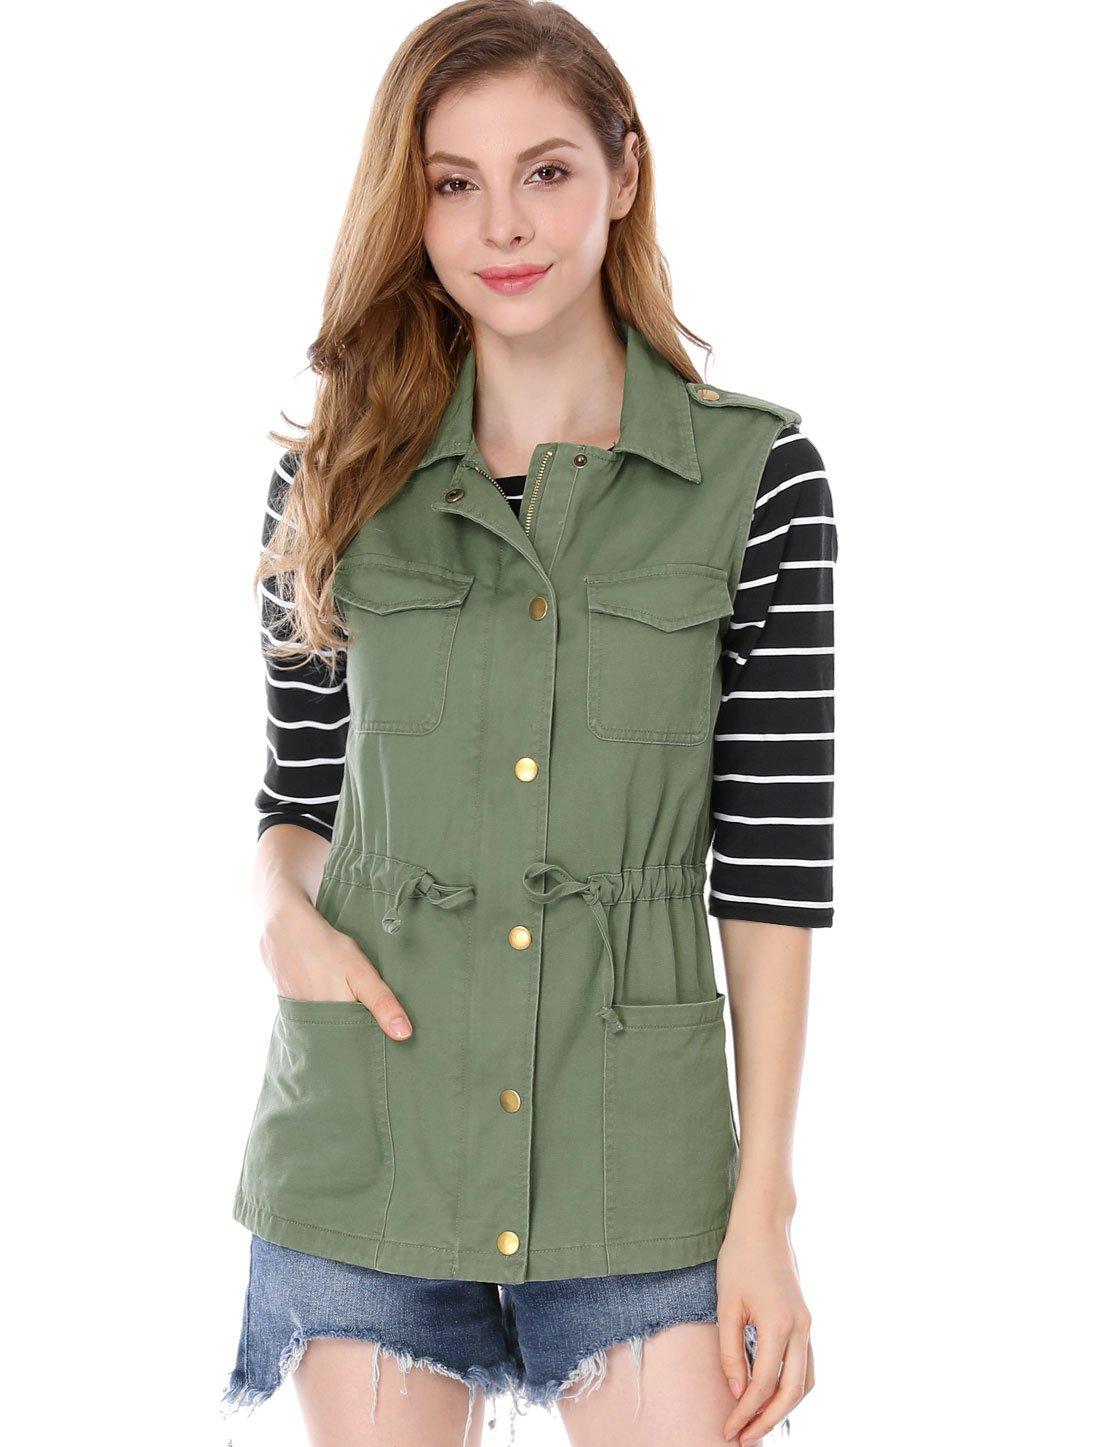 Allegra K Women's Functional Pockets Drawstring Waist Cargo Vest M Green  (US  10)